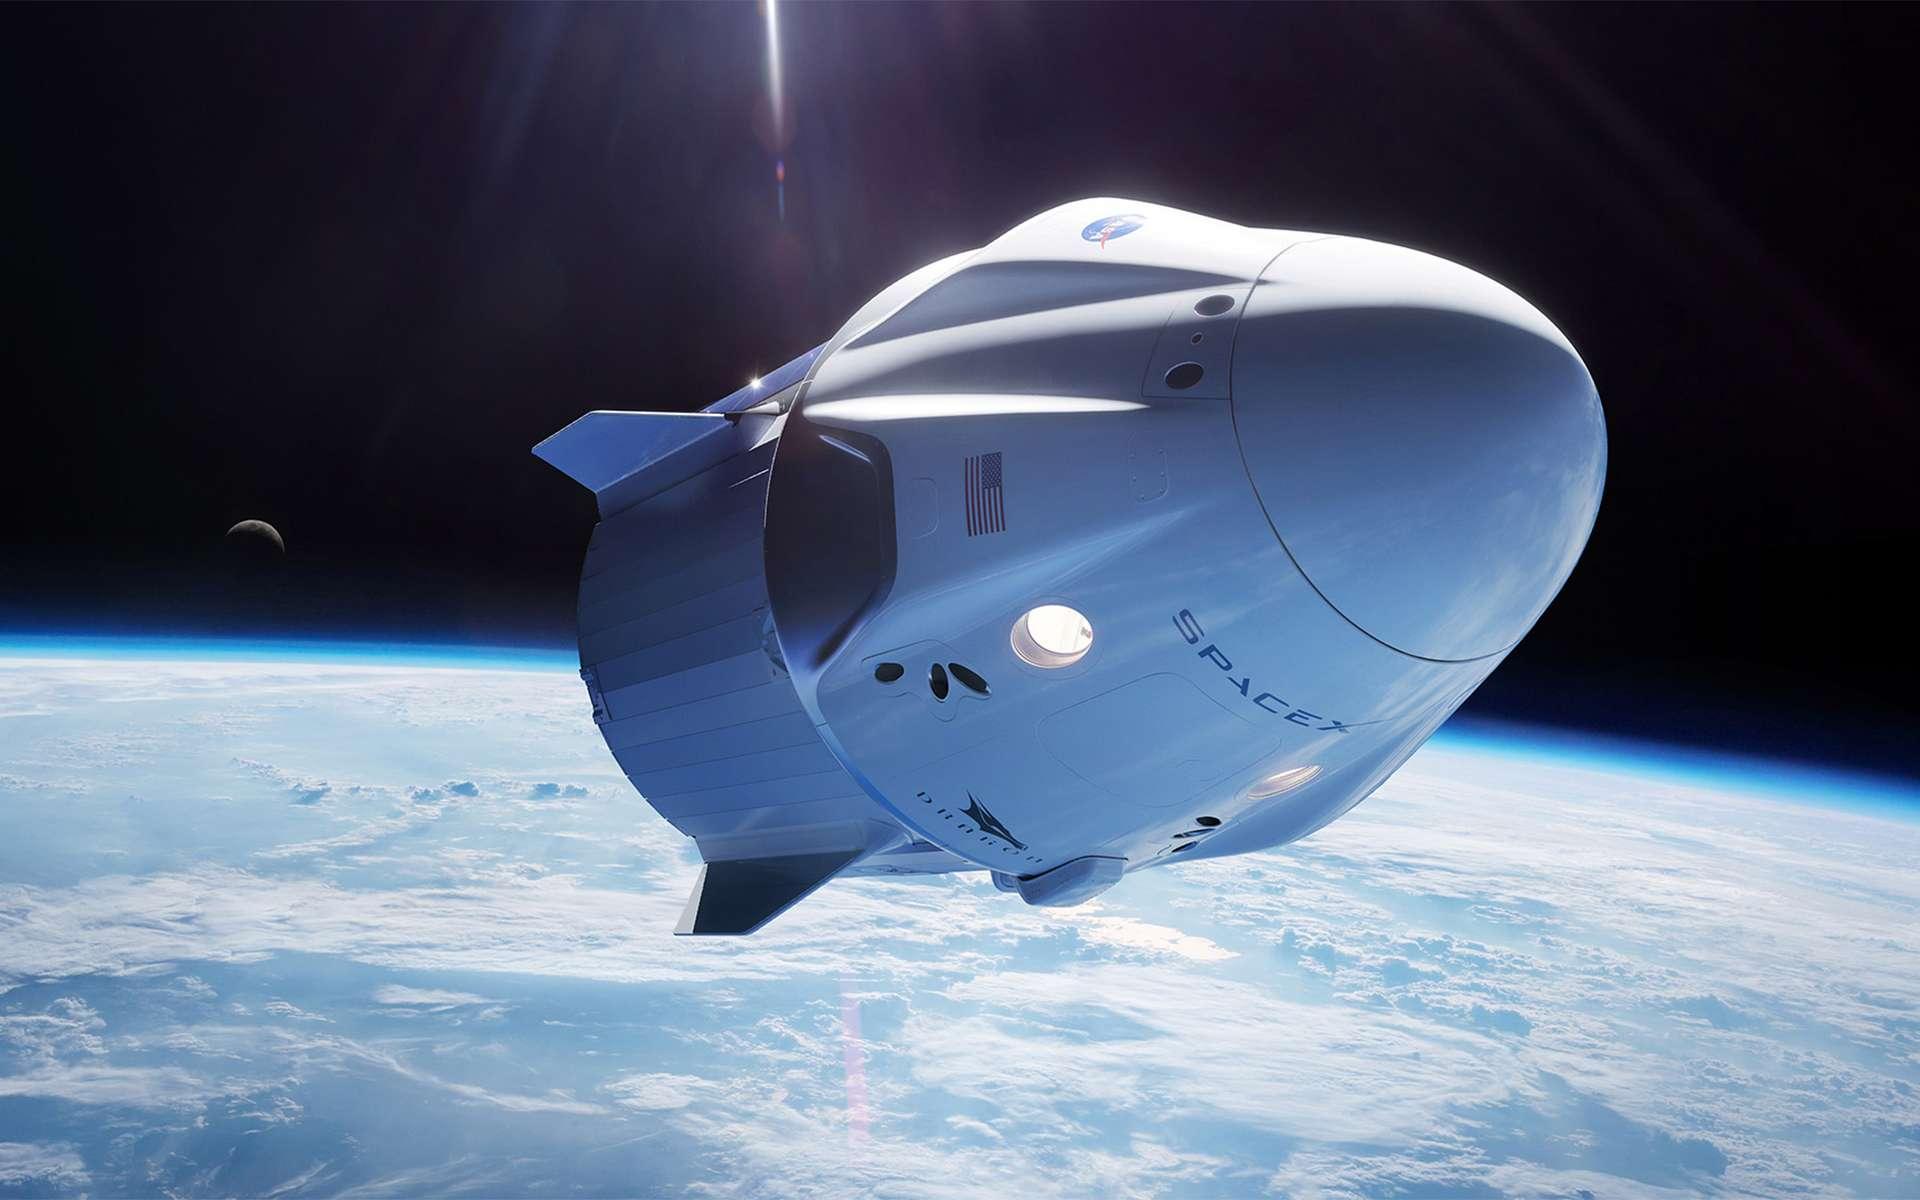 Vue d'artiste de la capsule Crew Dragon de SpaceX. © SpaceX